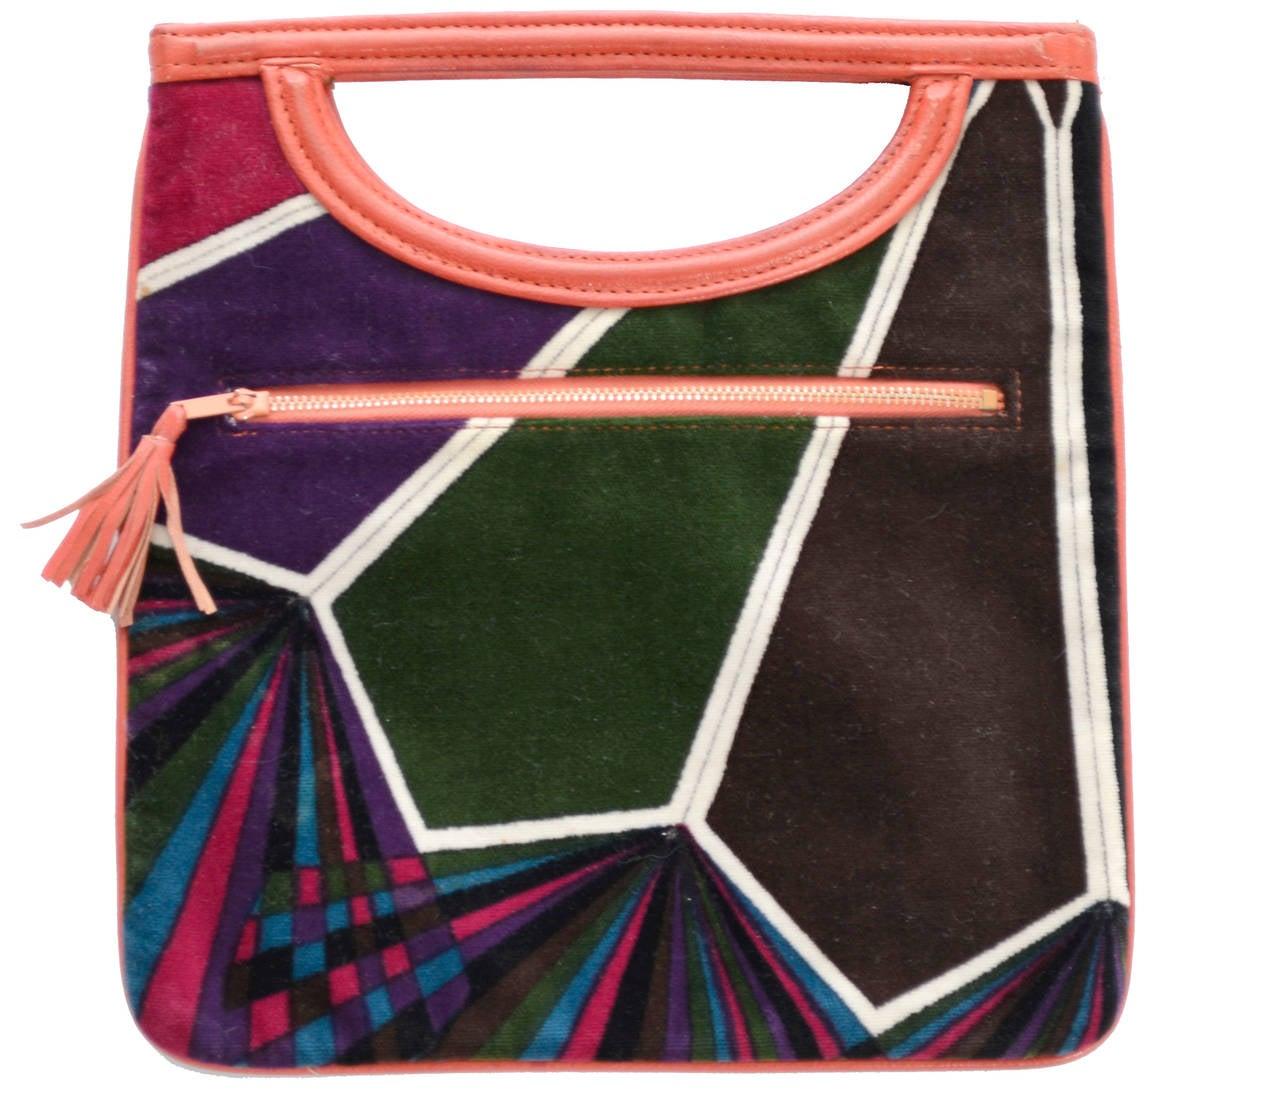 Black 1960s Rare Emilio Pucci Jana Vintage Velvet Handbag Mod Geometric OpArt Rare Bag For Sale